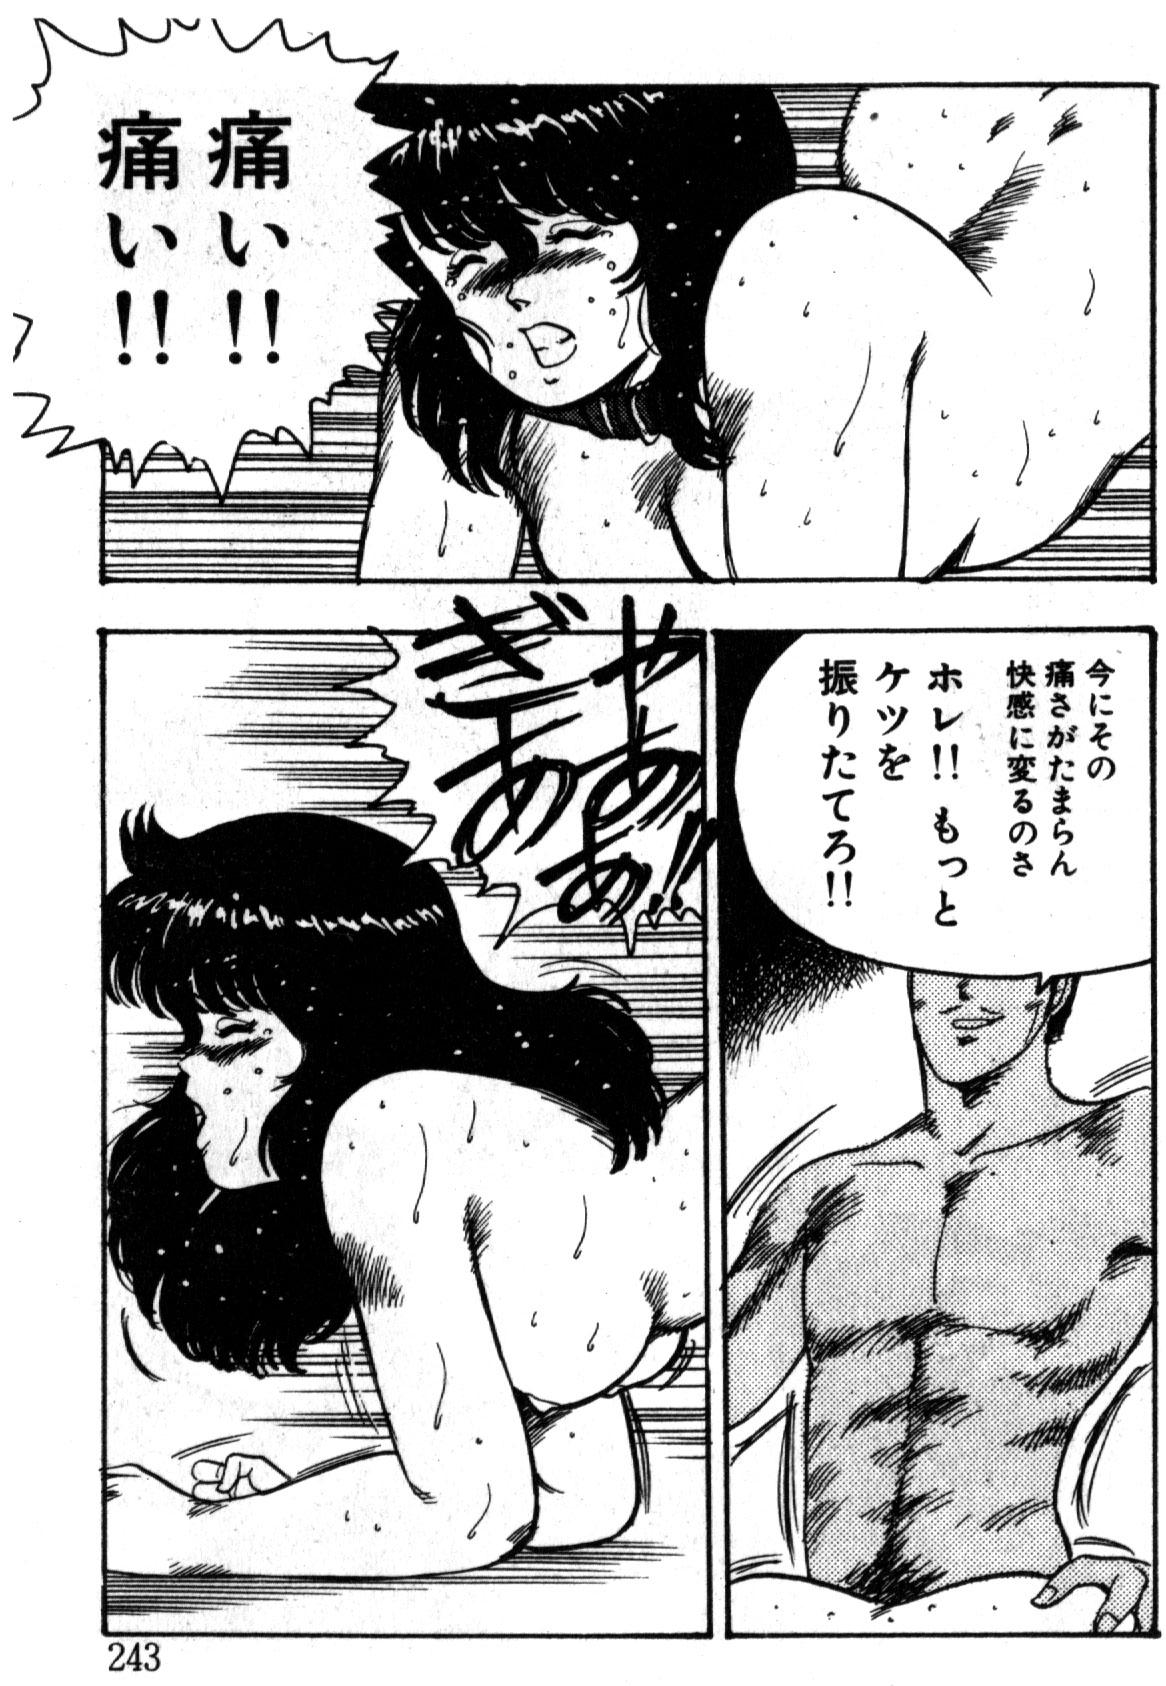 Keiko Sensei no Kagai Jugyou - Keiko Sensei Series 1 242